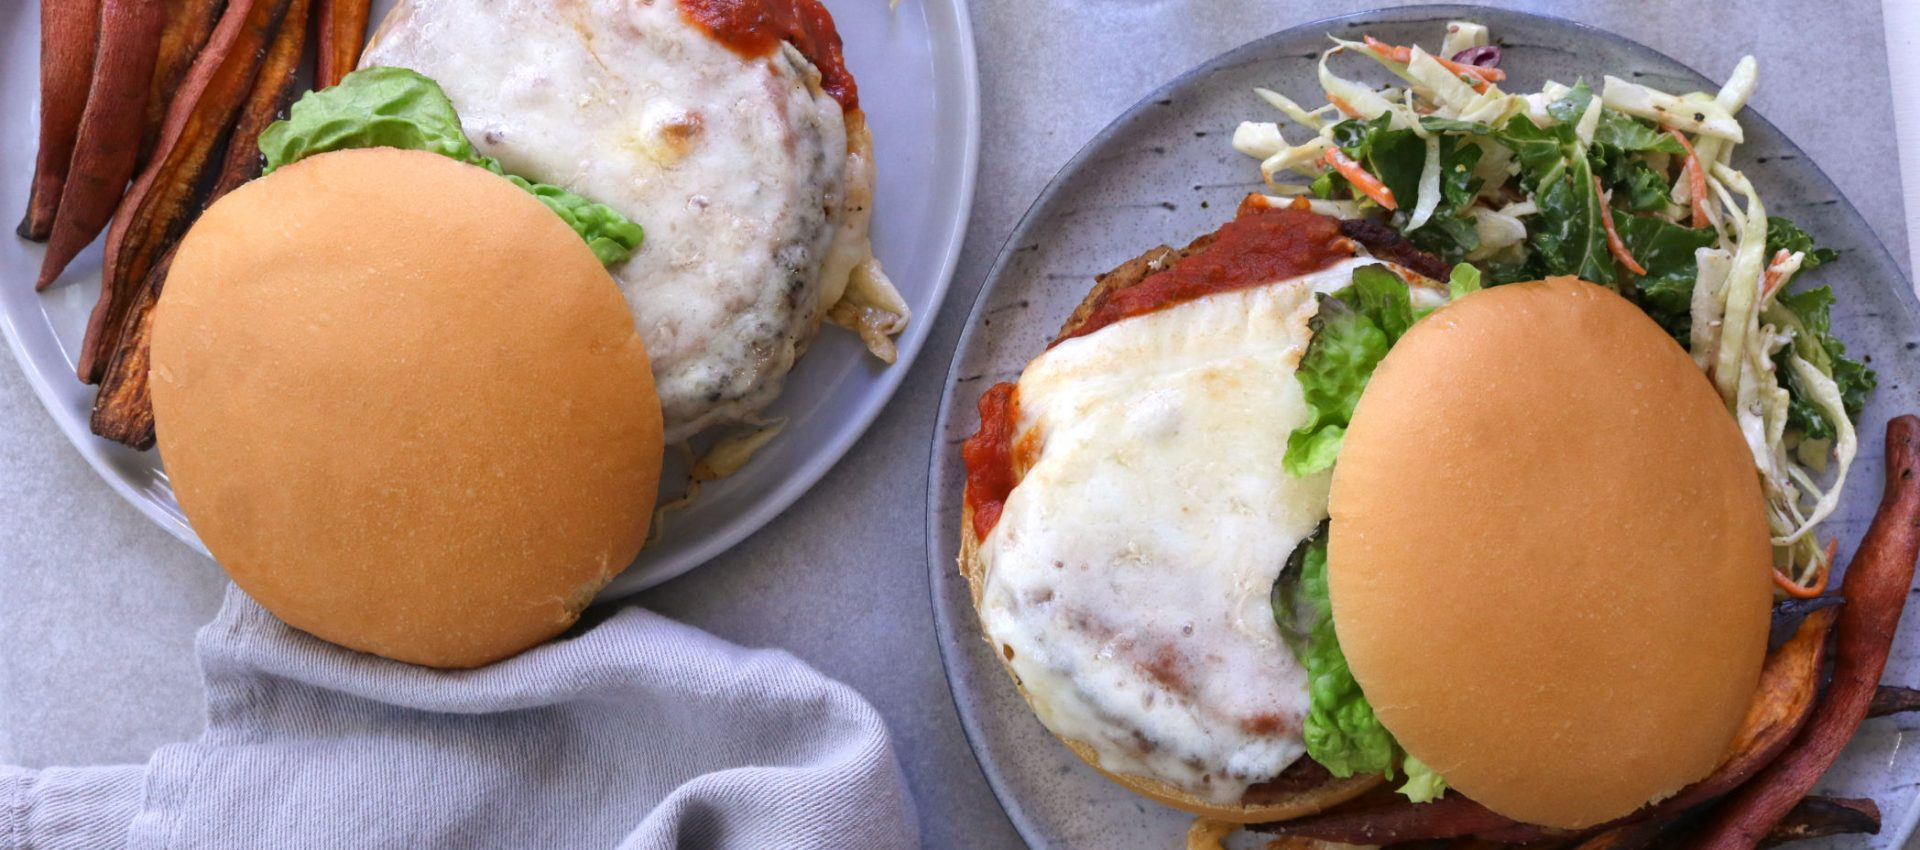 Turkey Parm Smashburgers 2